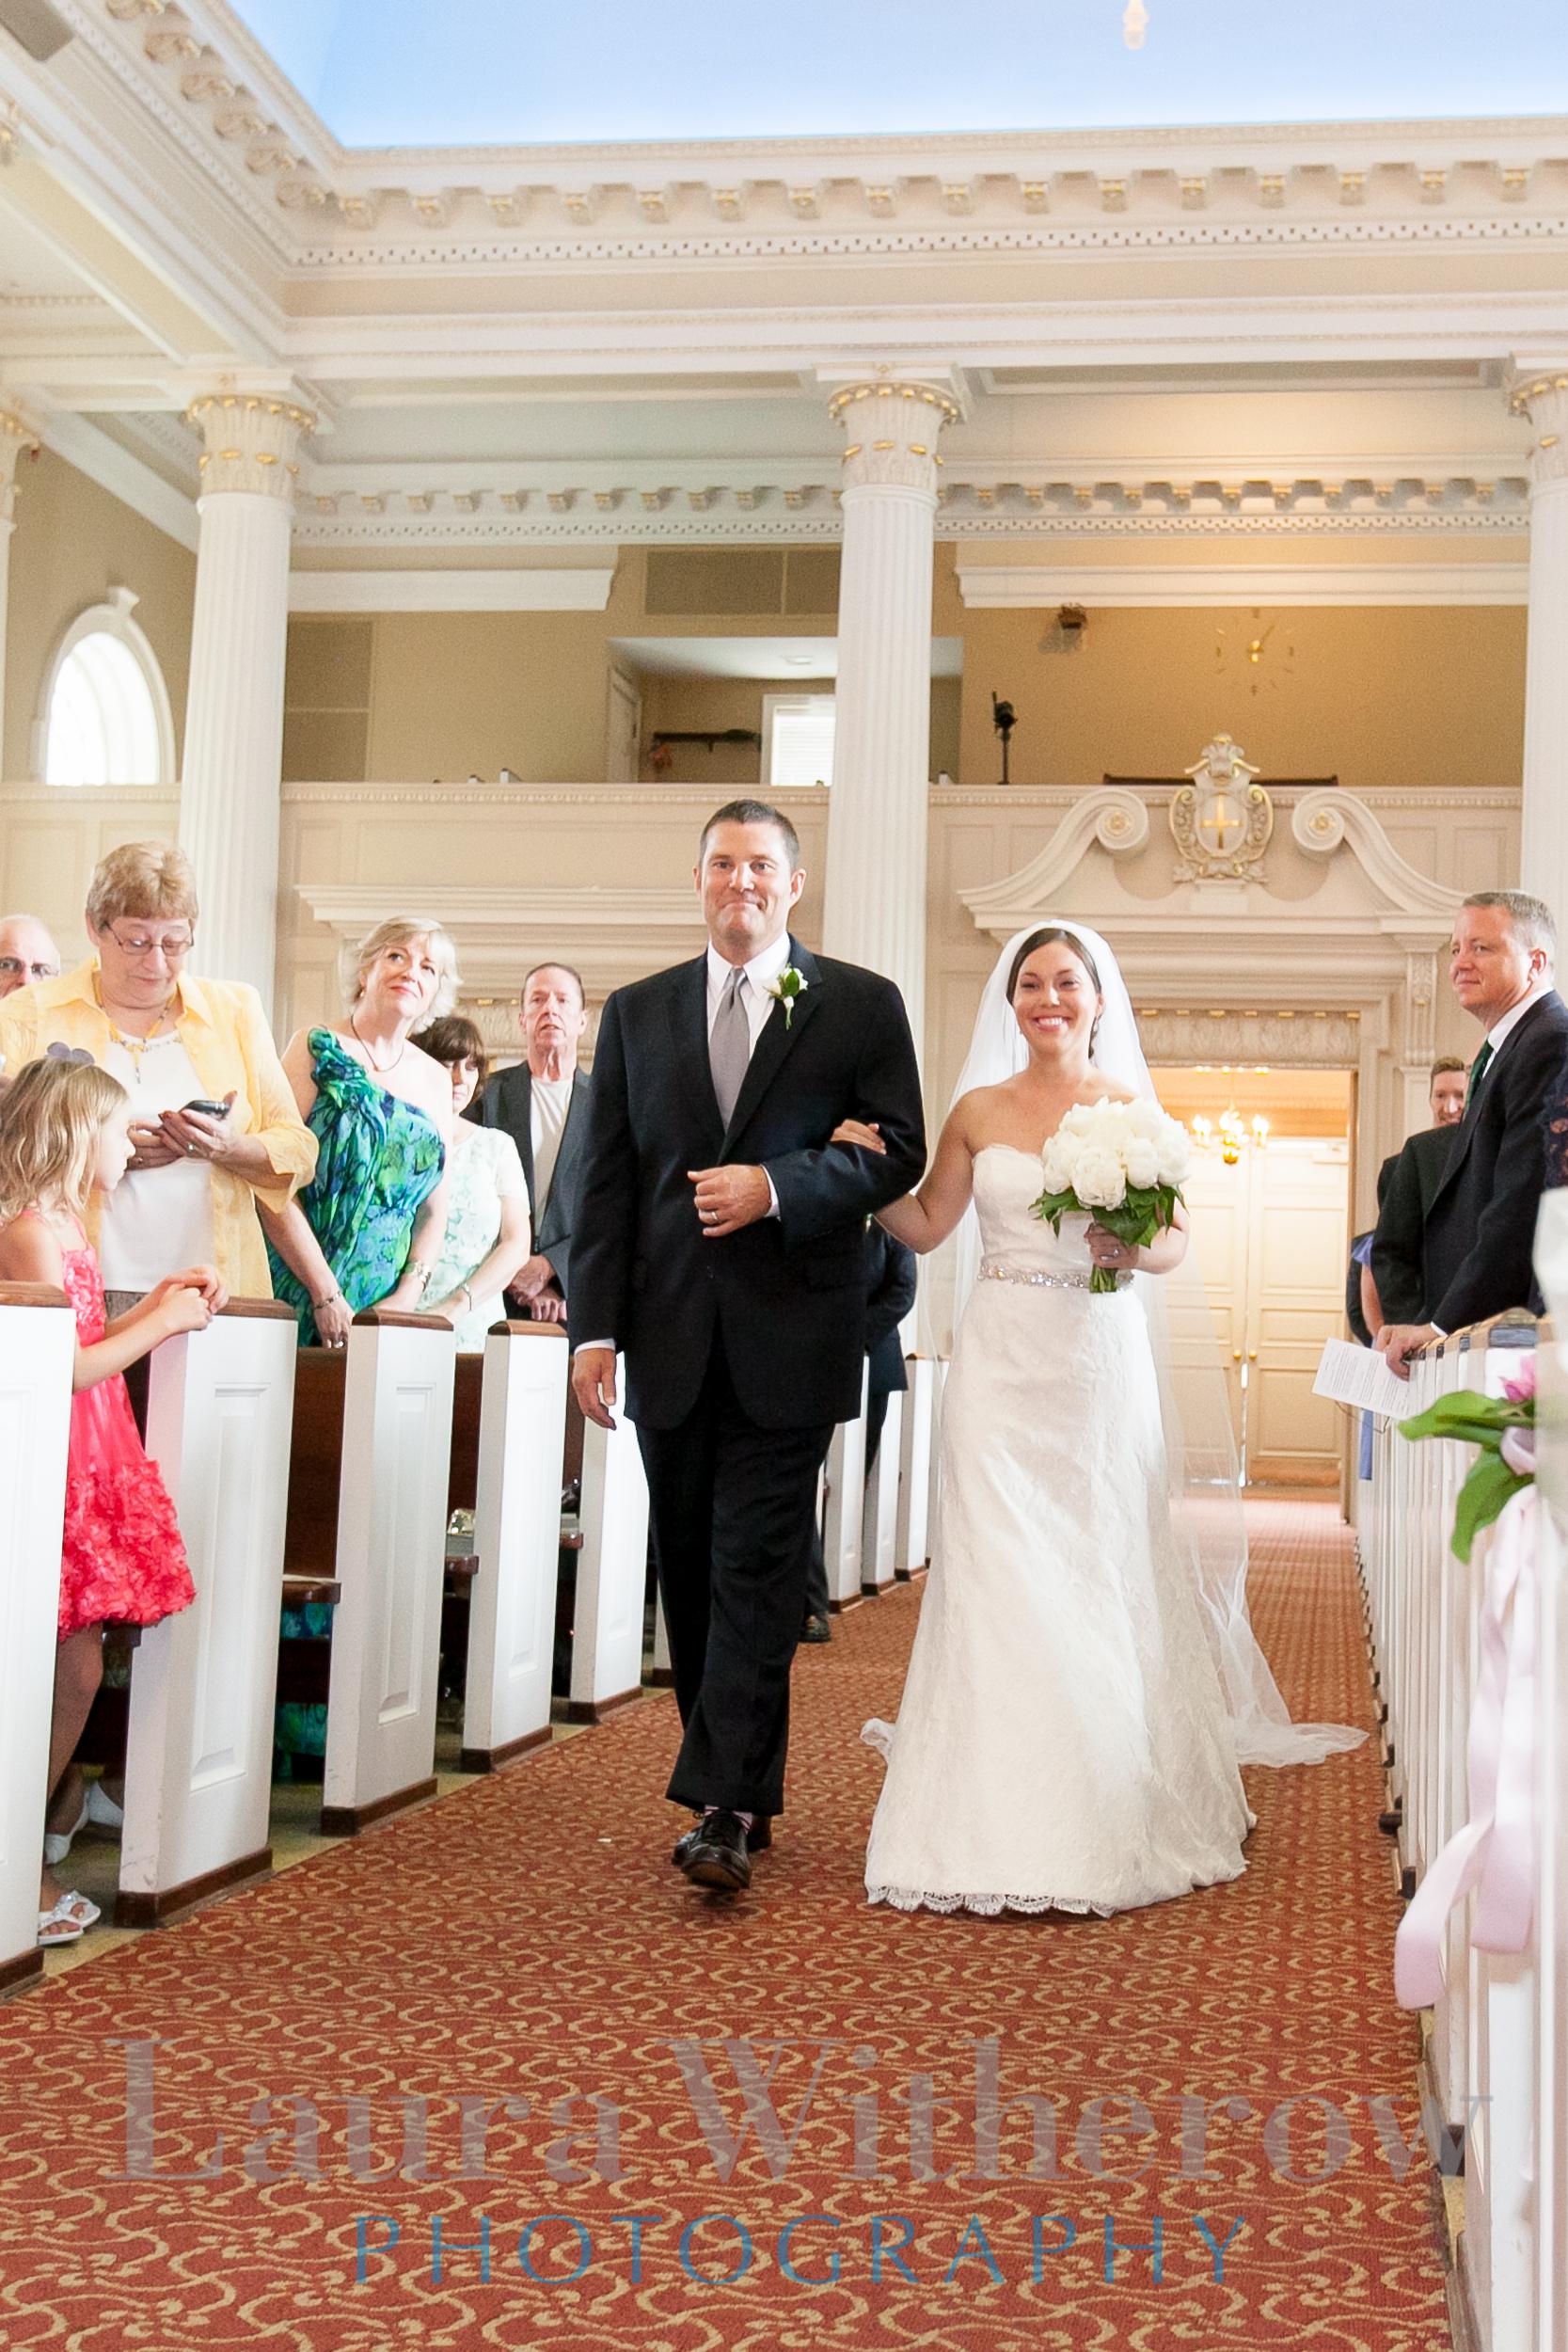 OLPH-wedding-photography.jpg